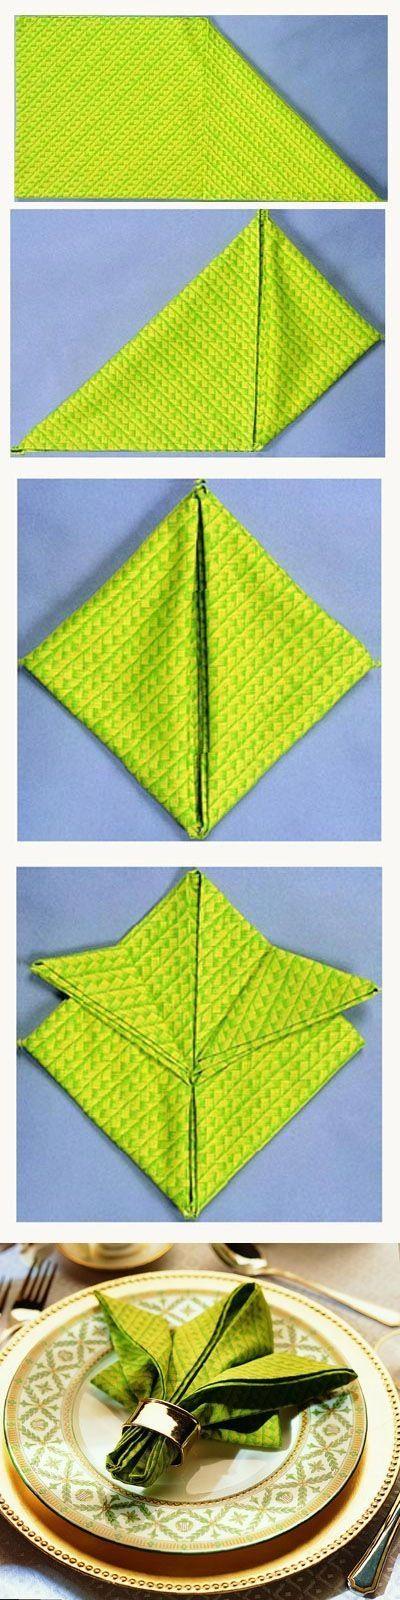 DIY Flower Napkin Fold DIY Projects   UsefulDIY.com